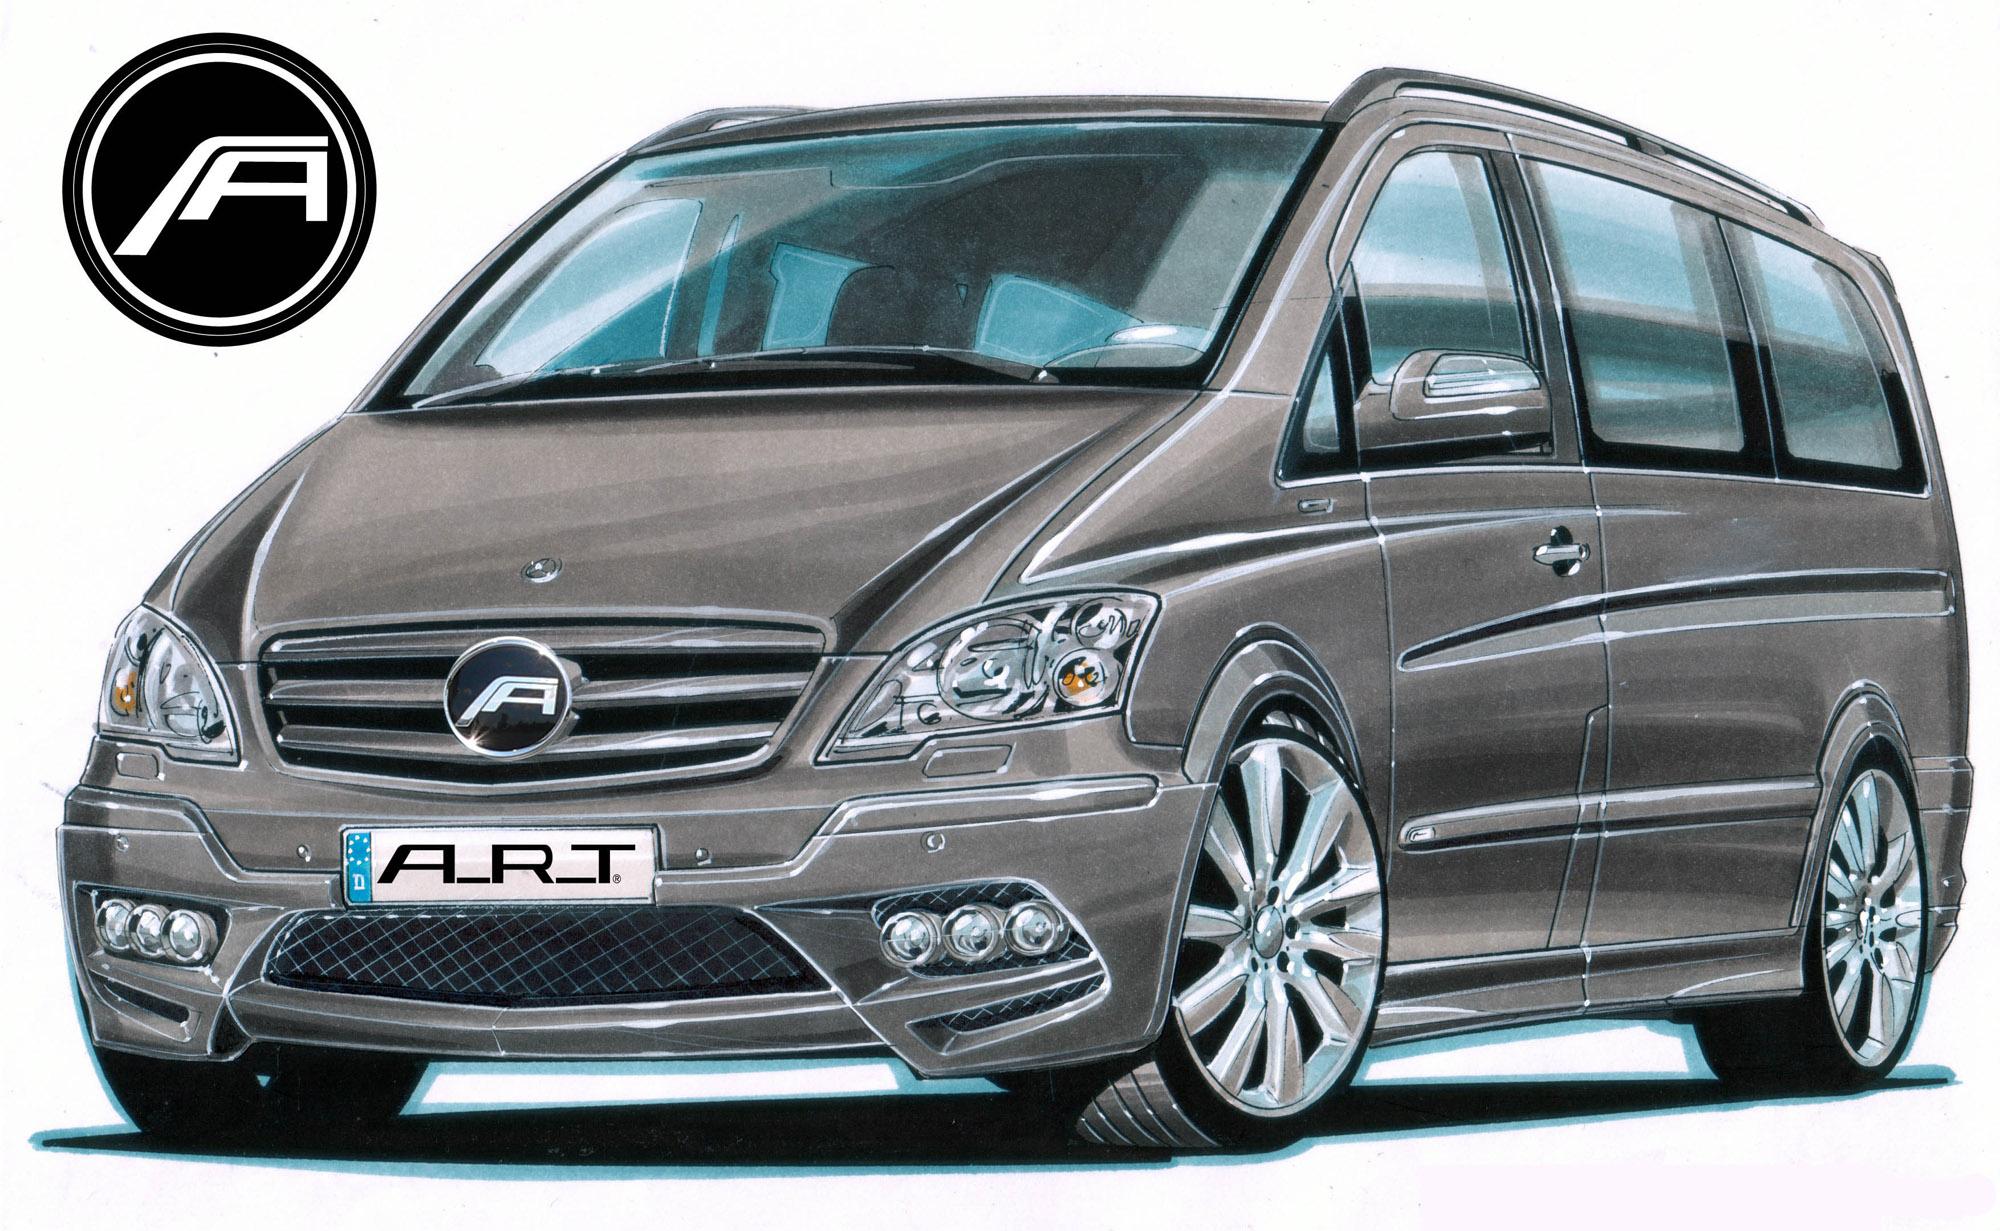 А. Р. Т тюнинг beutifies Mercedes-Benz Viano - фотография №1